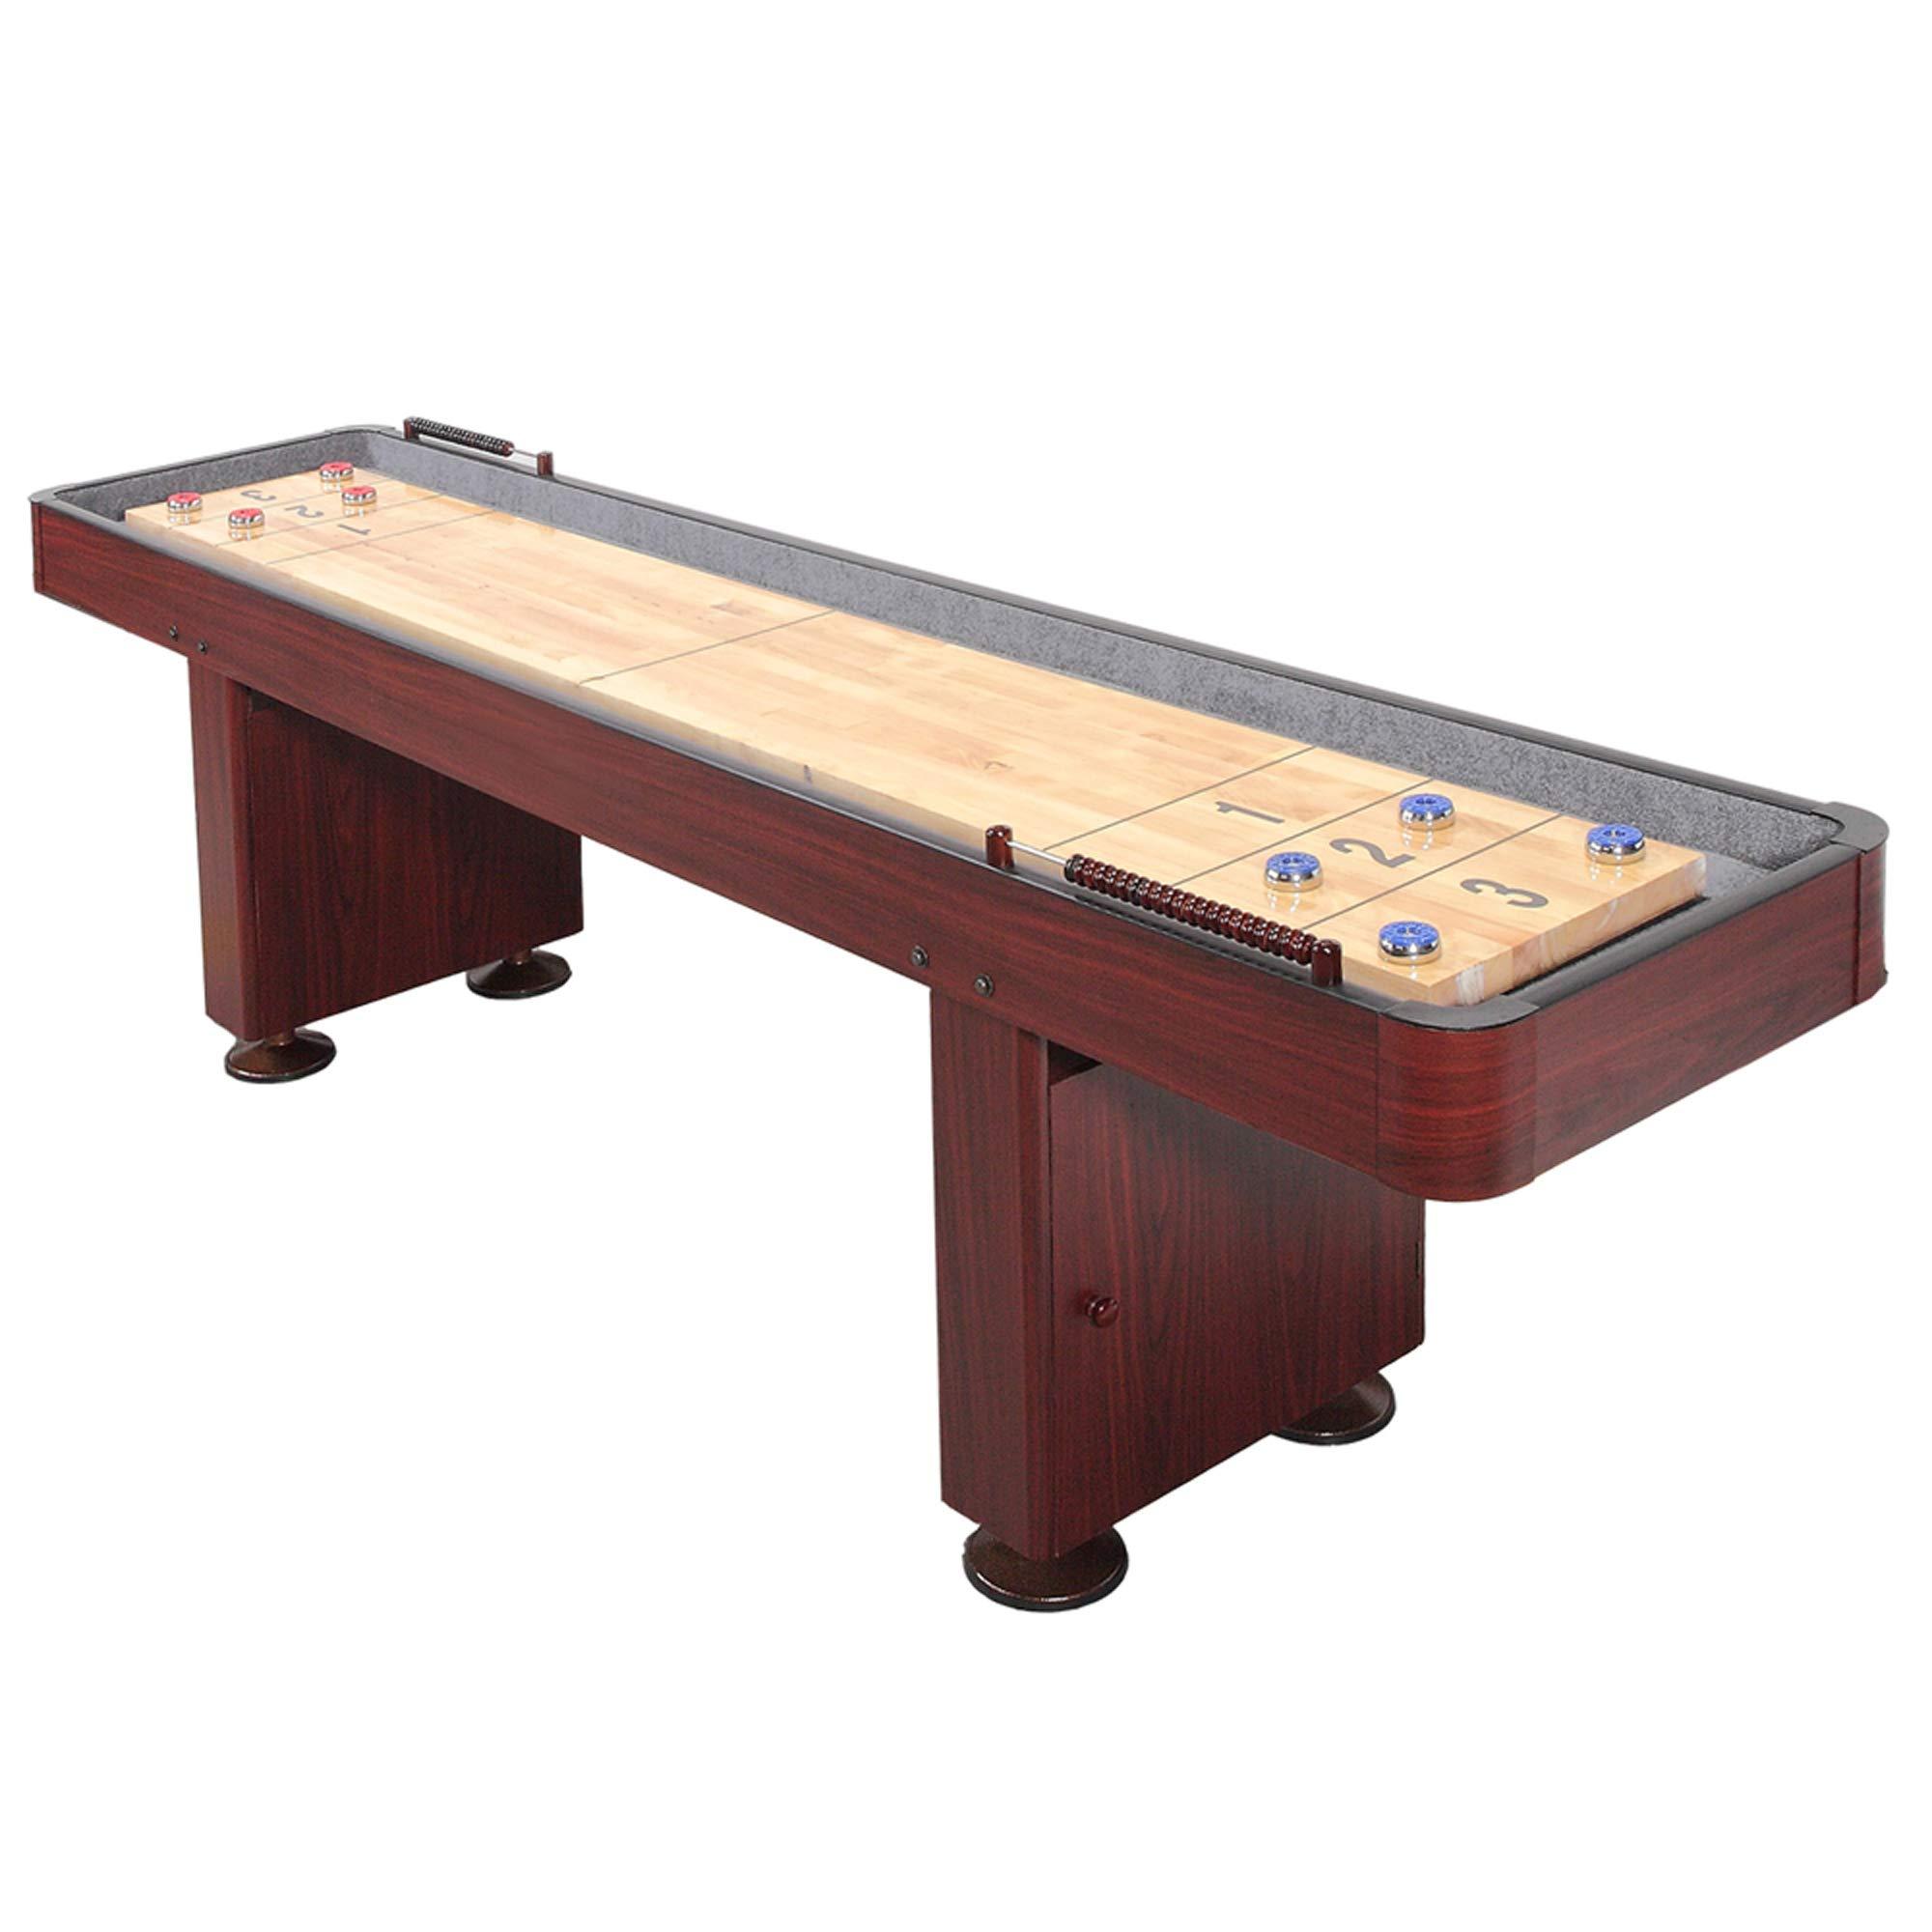 Challenger Shuffleboard Table w Dark Cherry Finish, Hardwood Playfield and Storage Cabinets